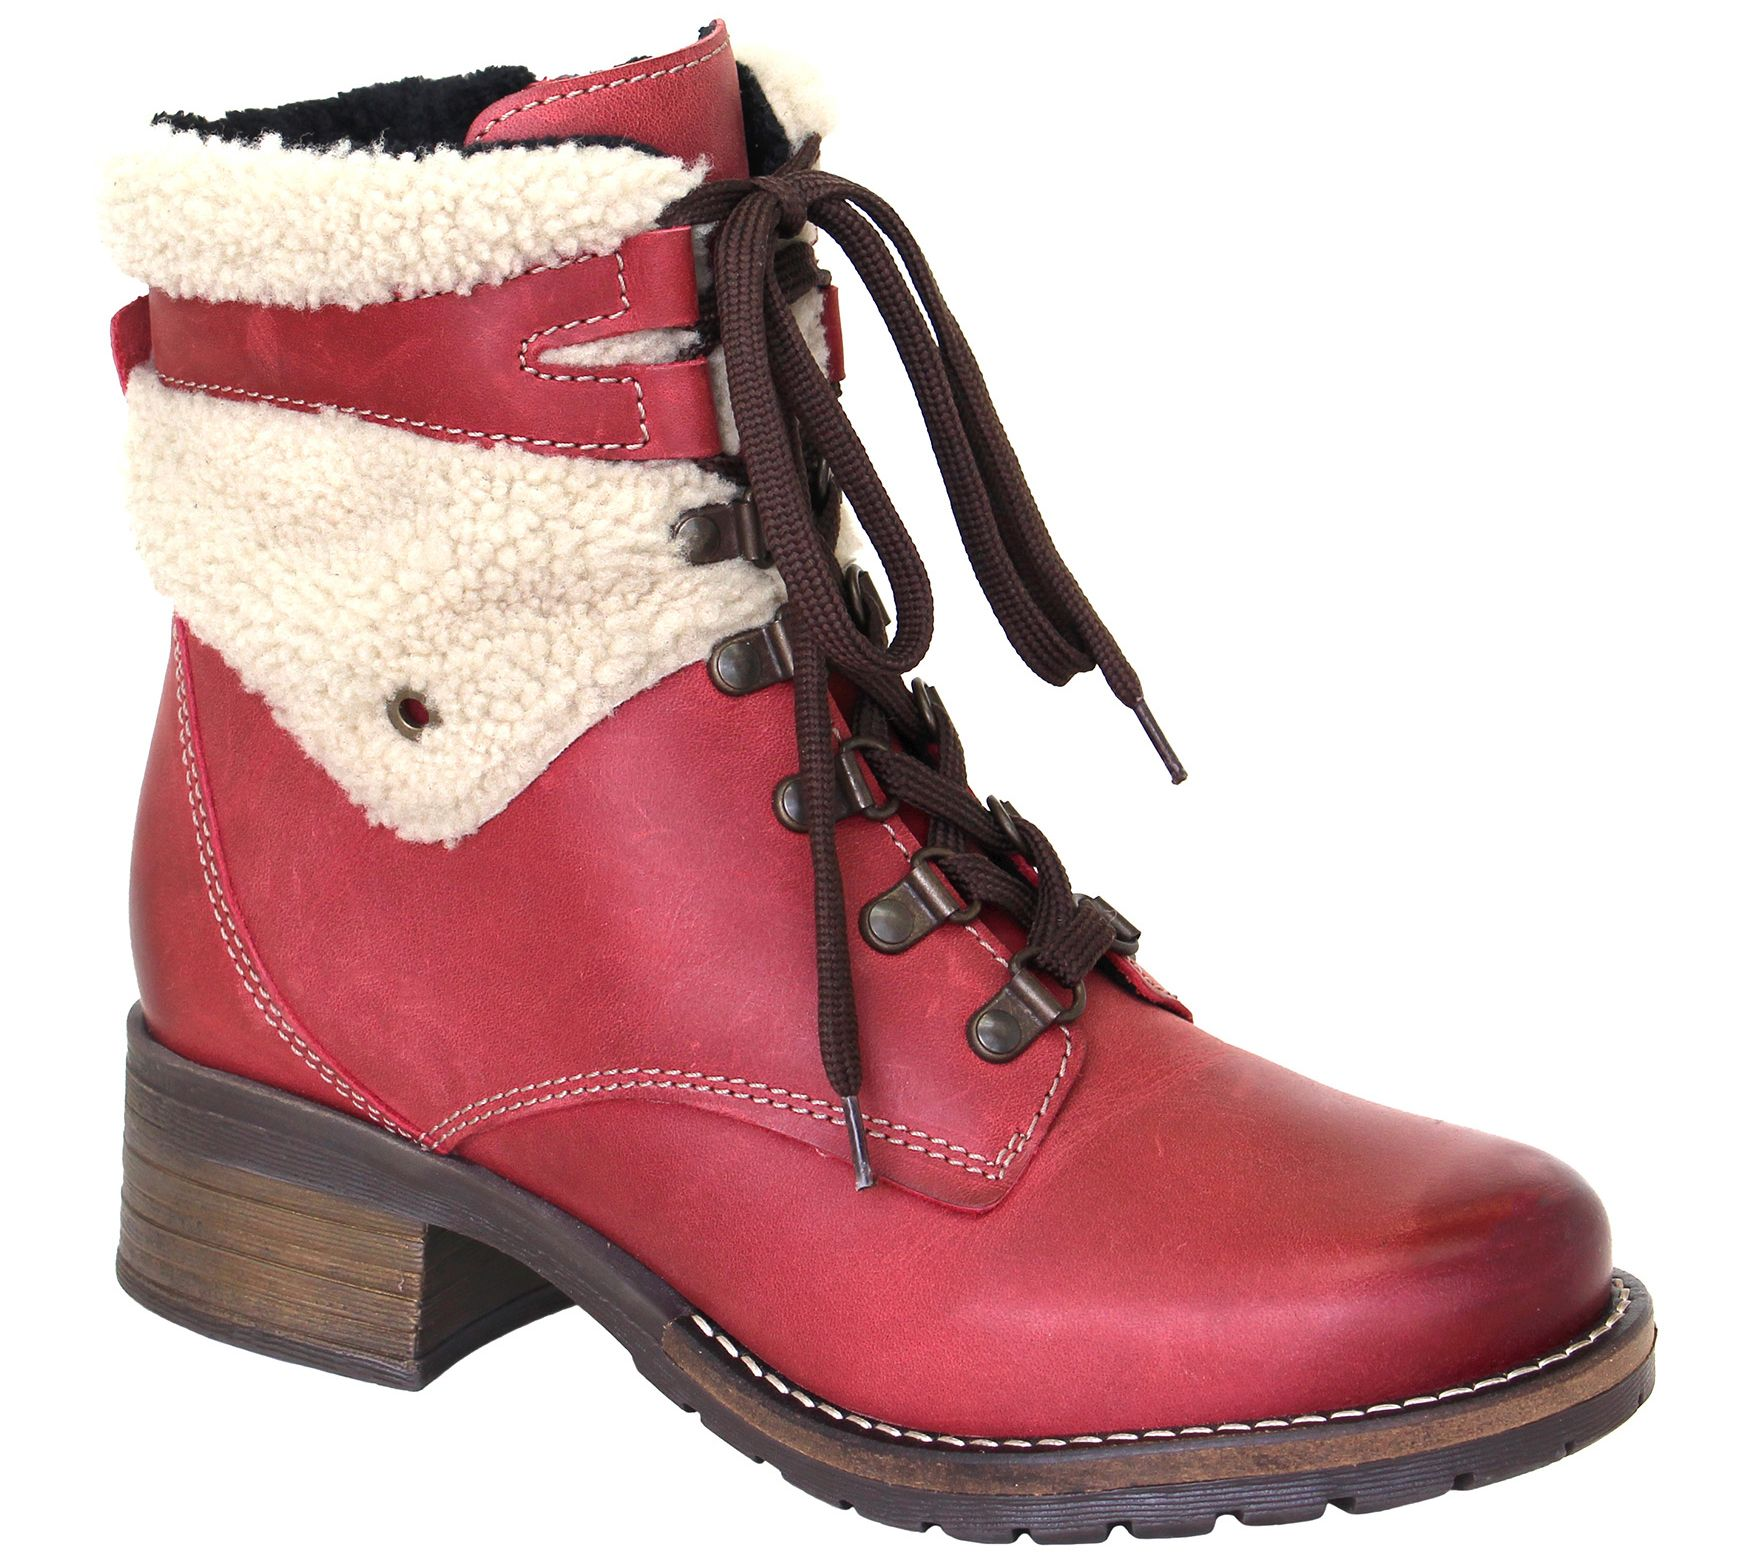 78ec81c0314f25 Dromedaris Leather Lace-Up Ankle Boots - Kara Shearling - Page 1 — QVC.com